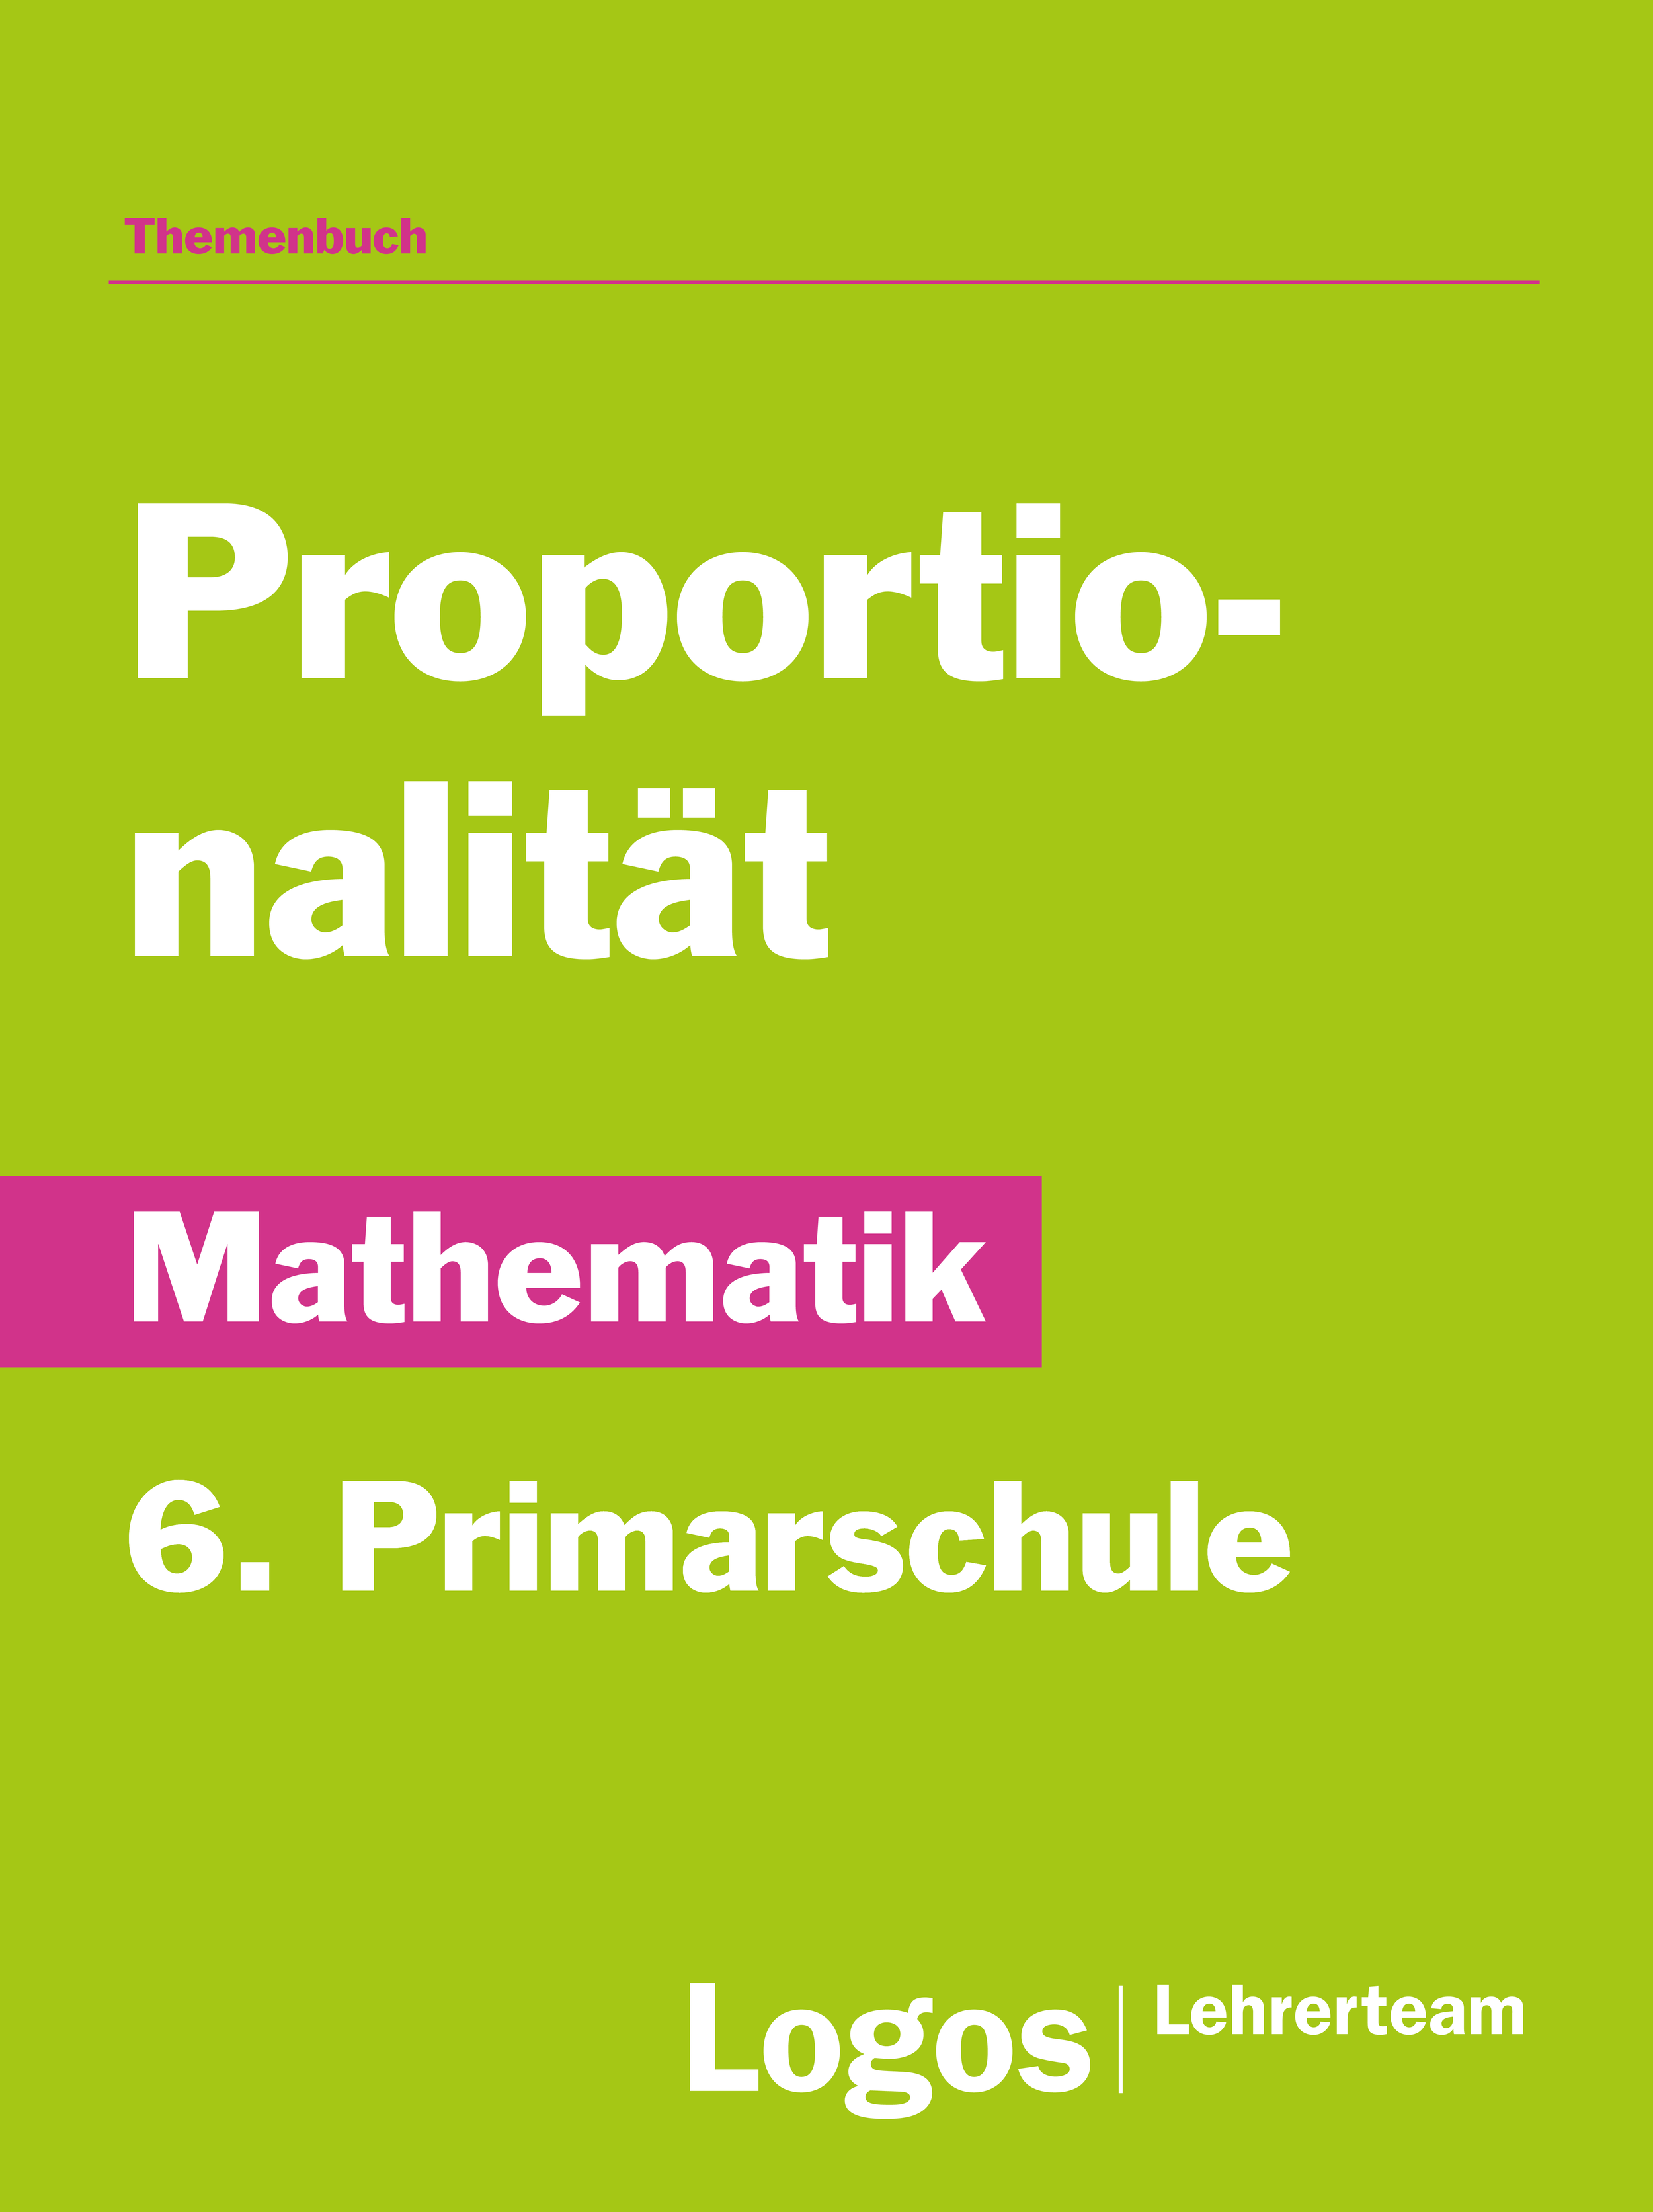 Mathematik Proportionalität - 6. Primarschule